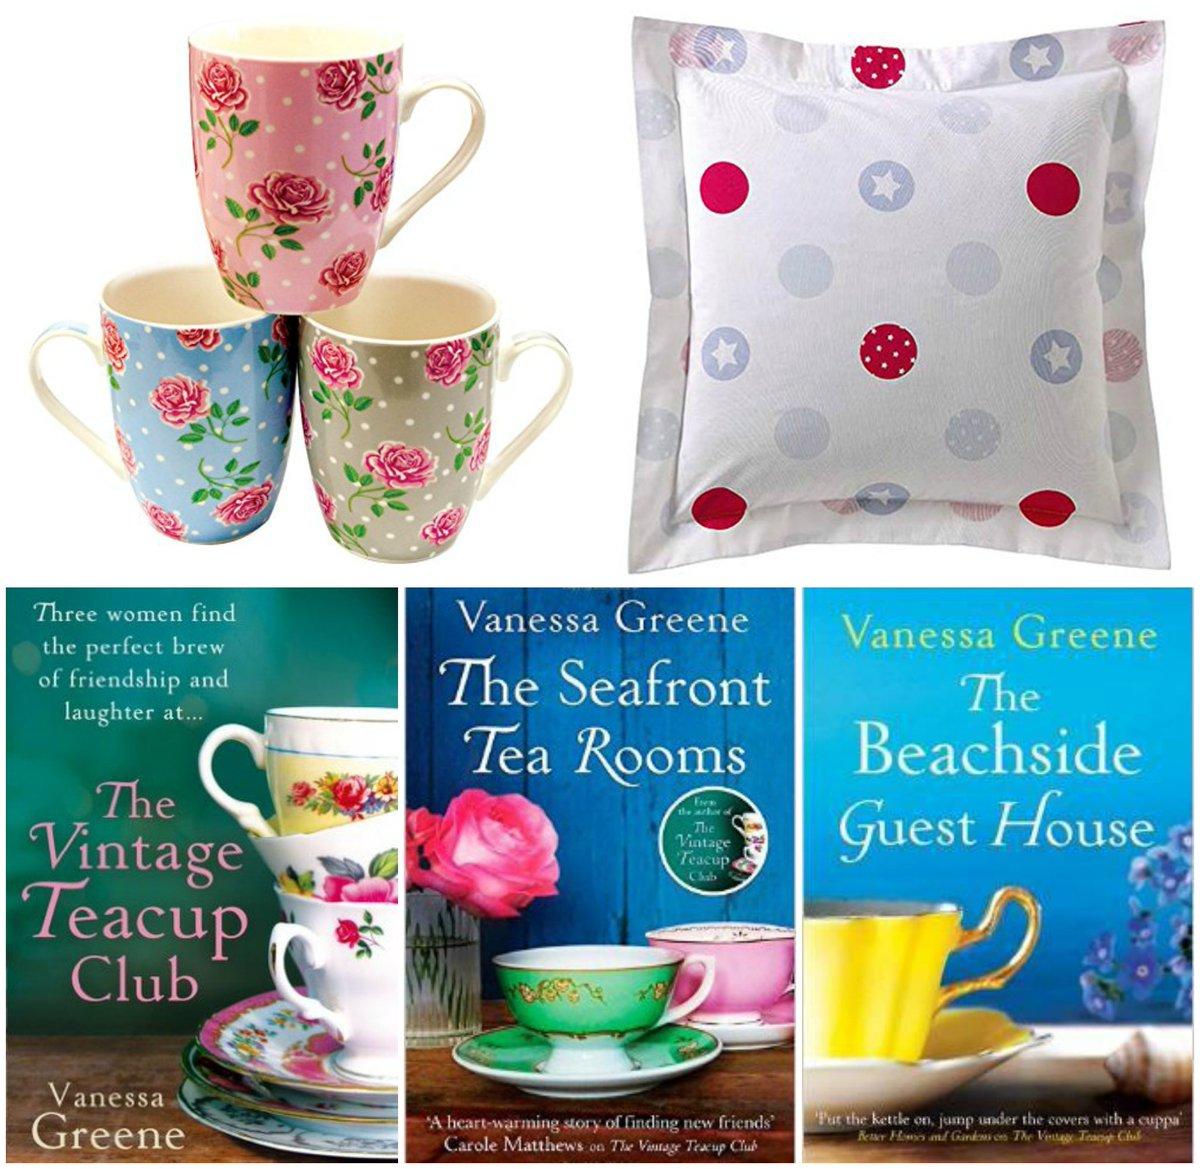 International #giveaway, #win #books by Vanessa Greene, #mugs, #tea &amp; a #pillow!   http://www. withloveforbooks.com/2017/08/tea-mu gs-pillow-books-giveaway.html &nbsp; … <br>http://pic.twitter.com/xOqT7EbFkR